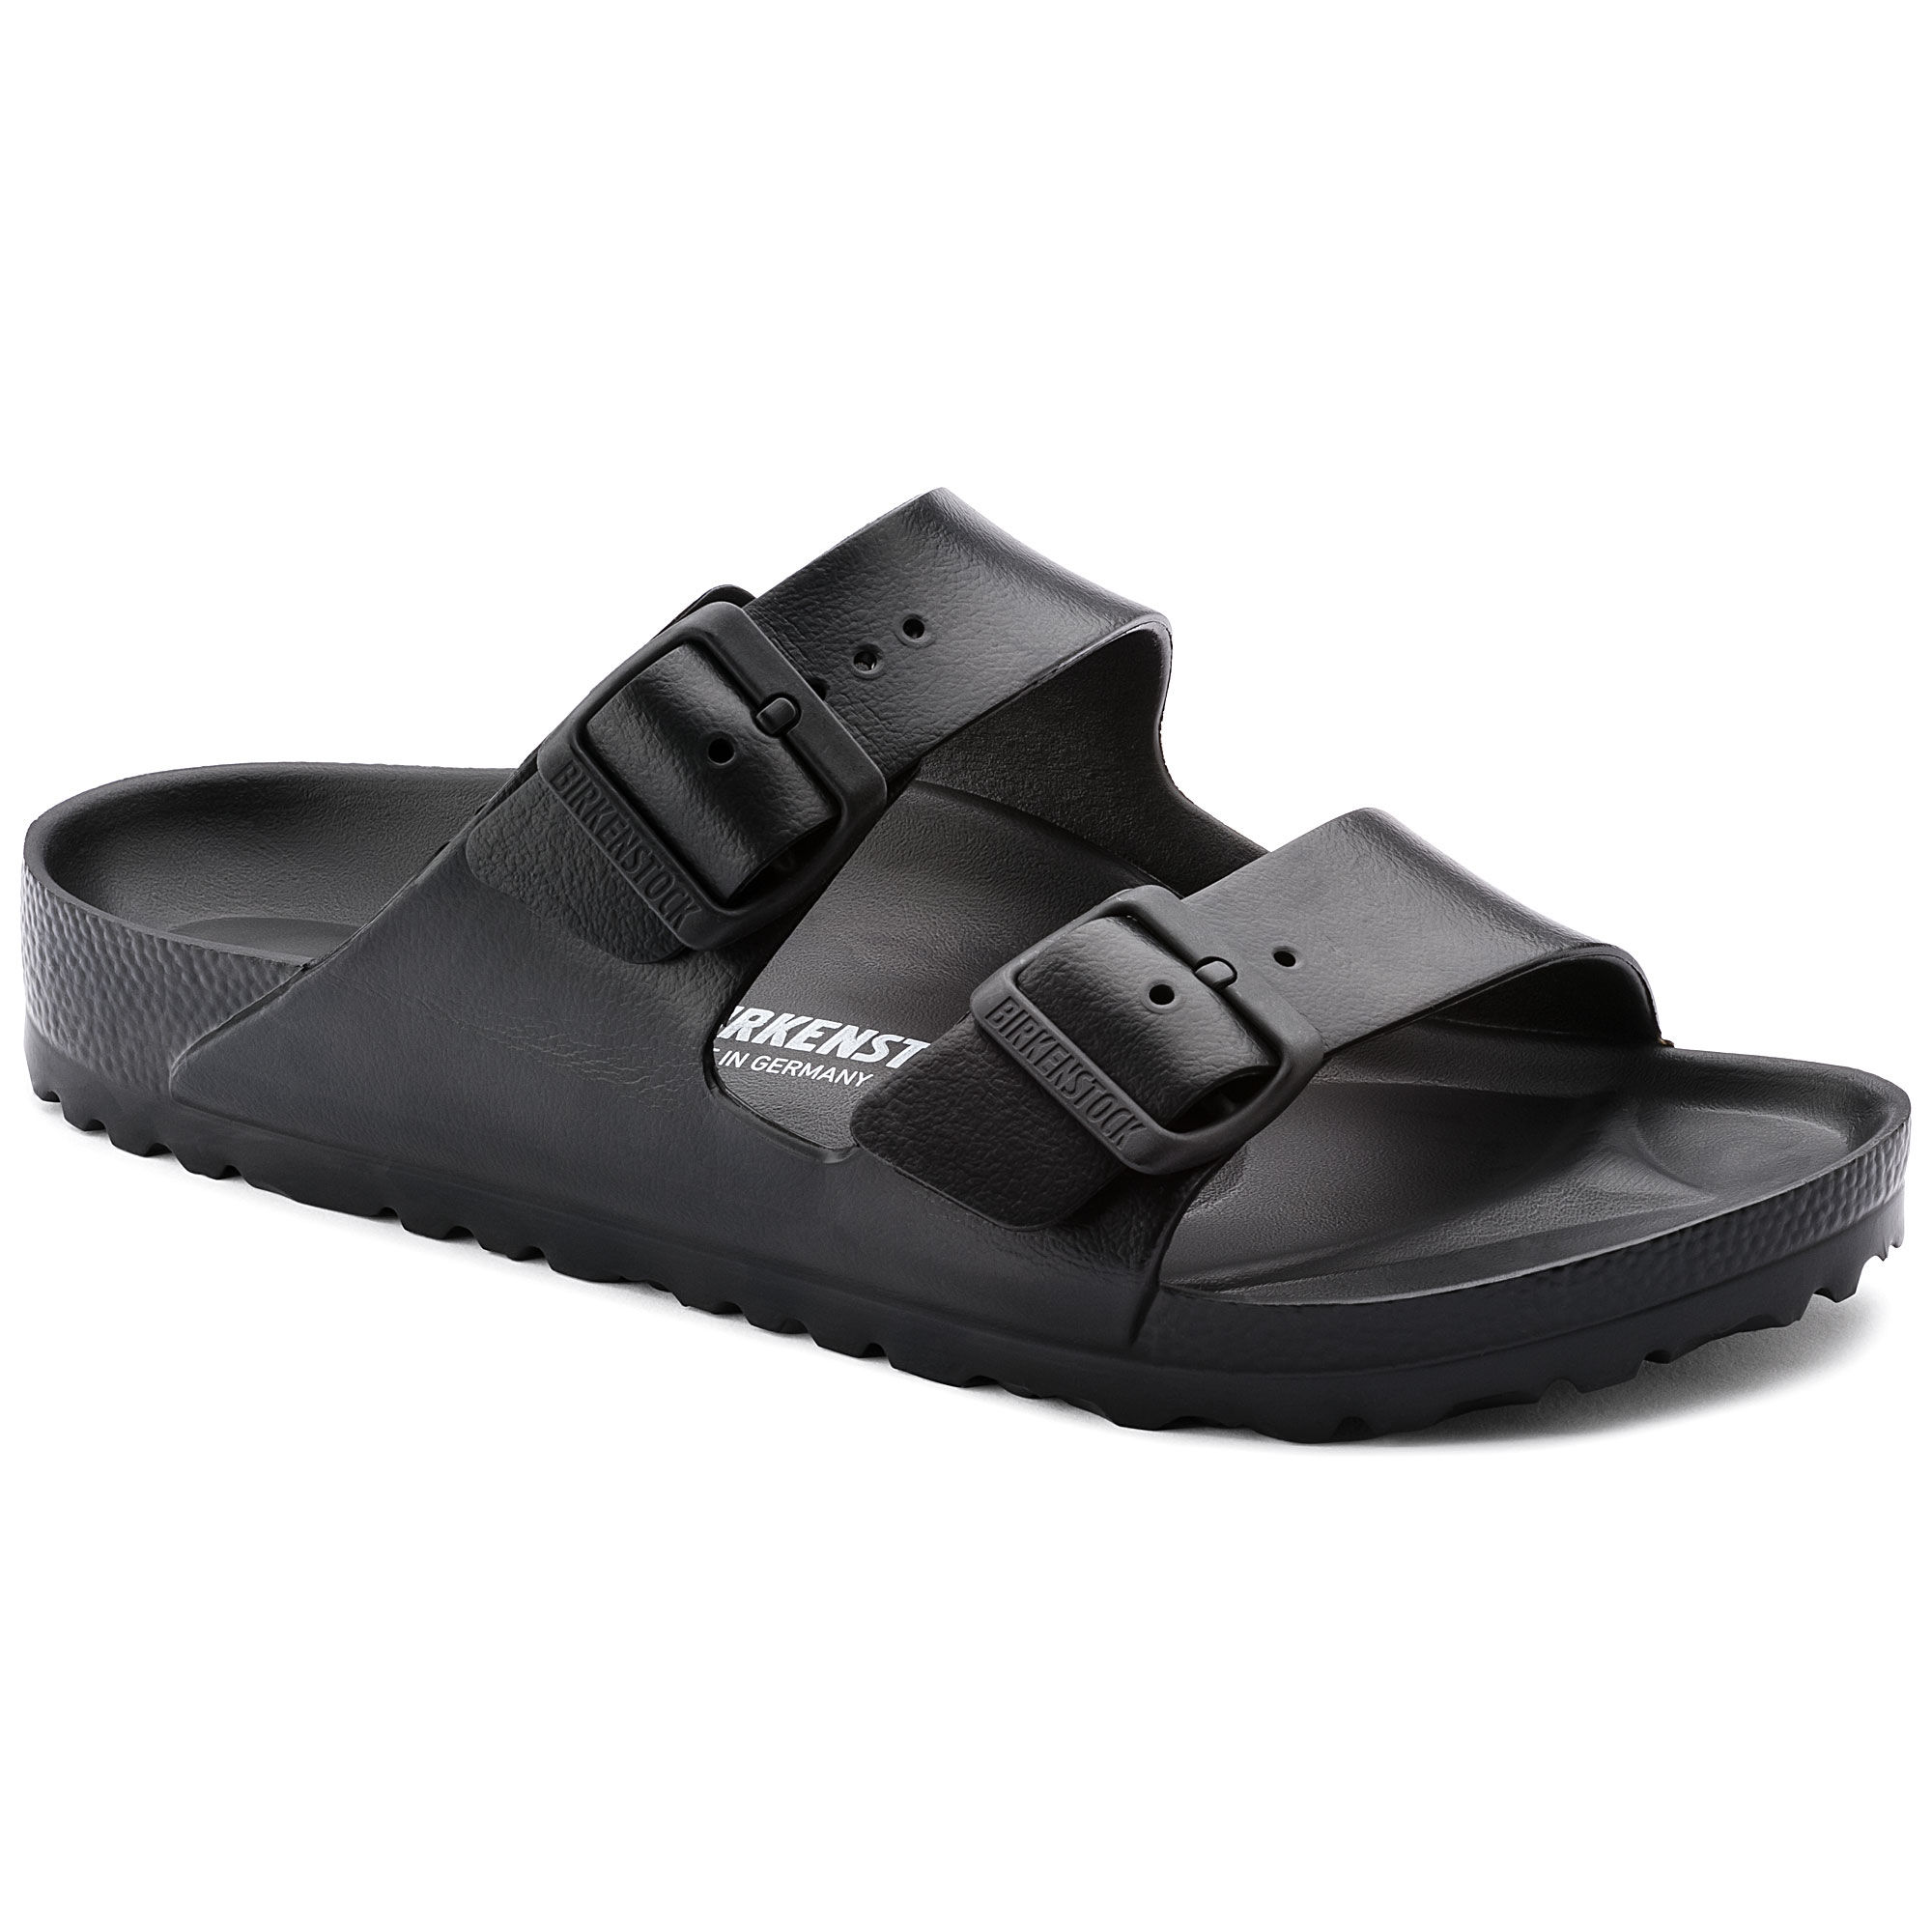 Birkenstock Arizona Black EVA Sandals